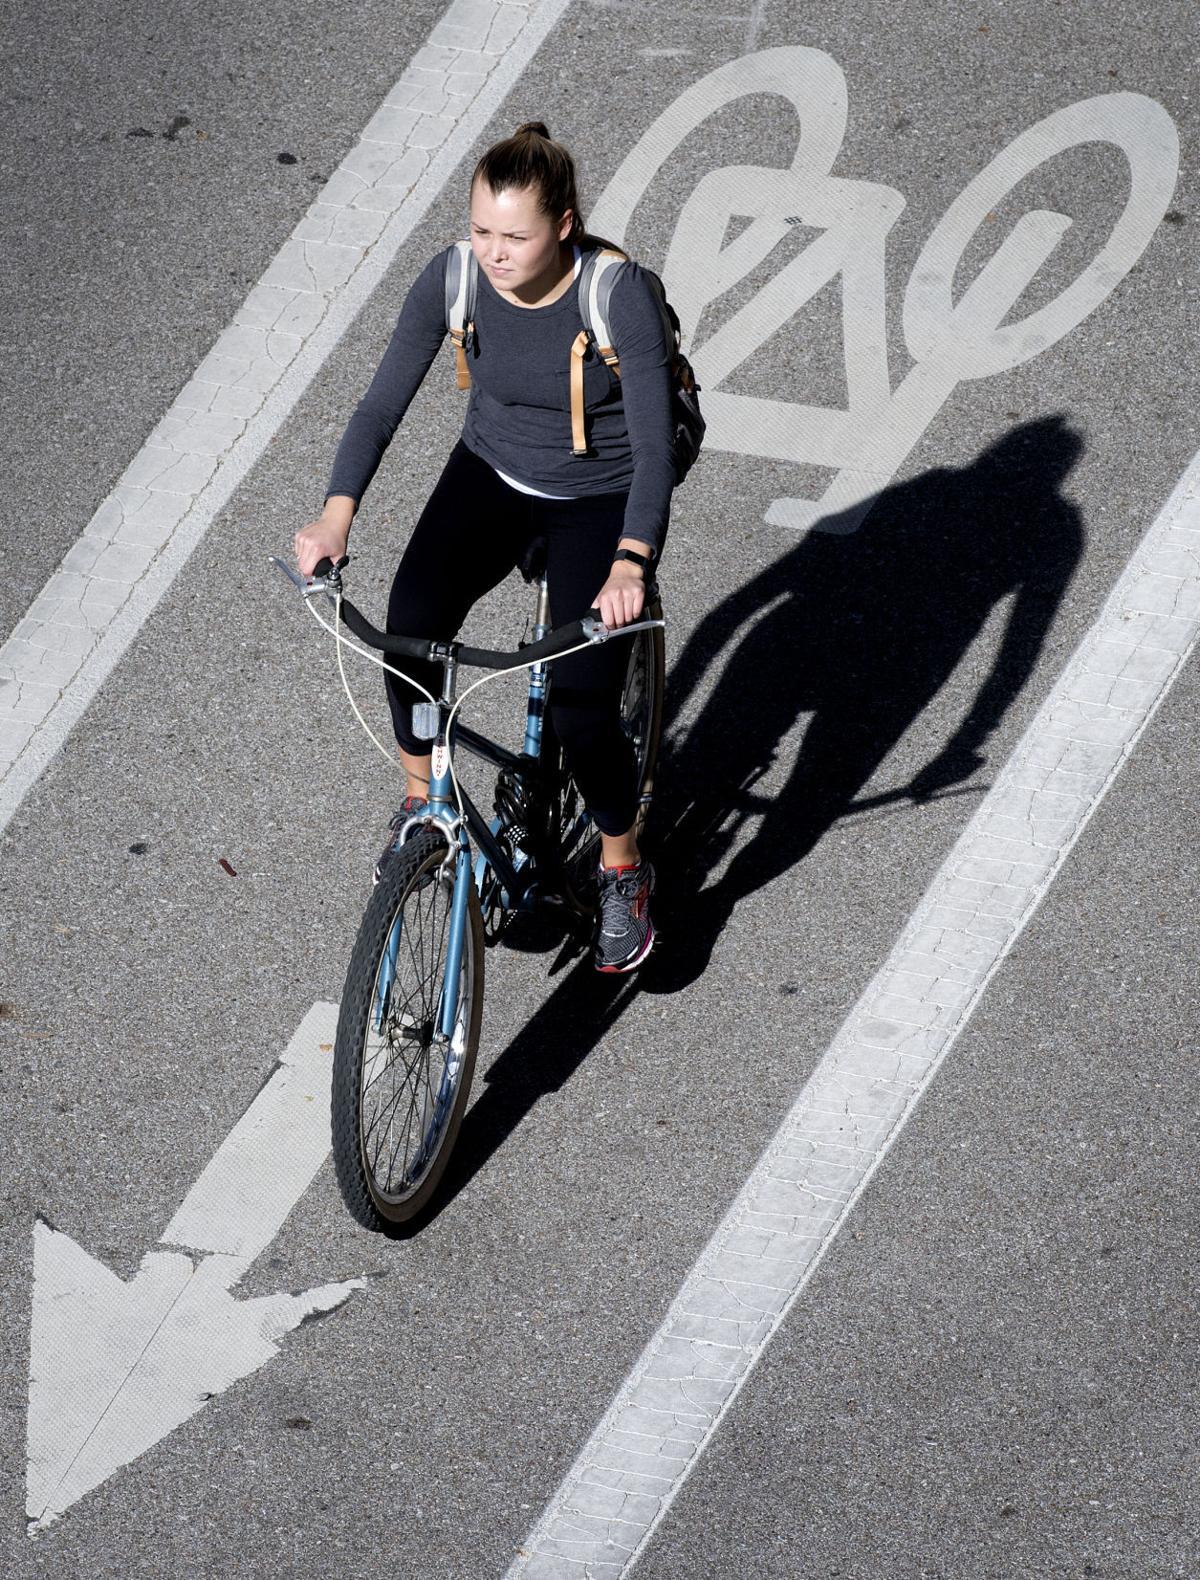 Bicyclist on bike lane